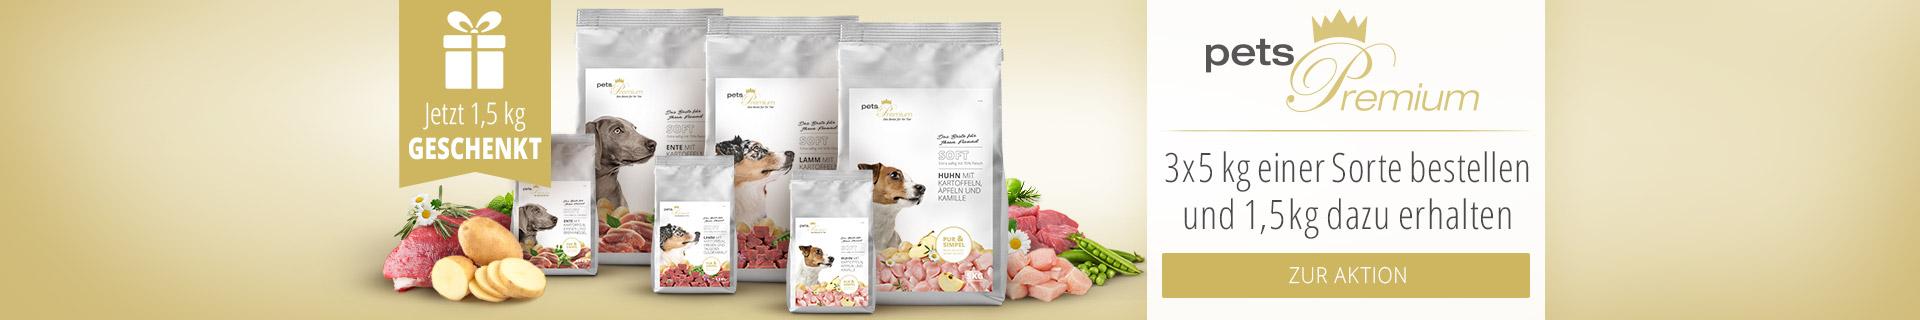 pets Premium Softfutter Aktion - 1,5kg gratis